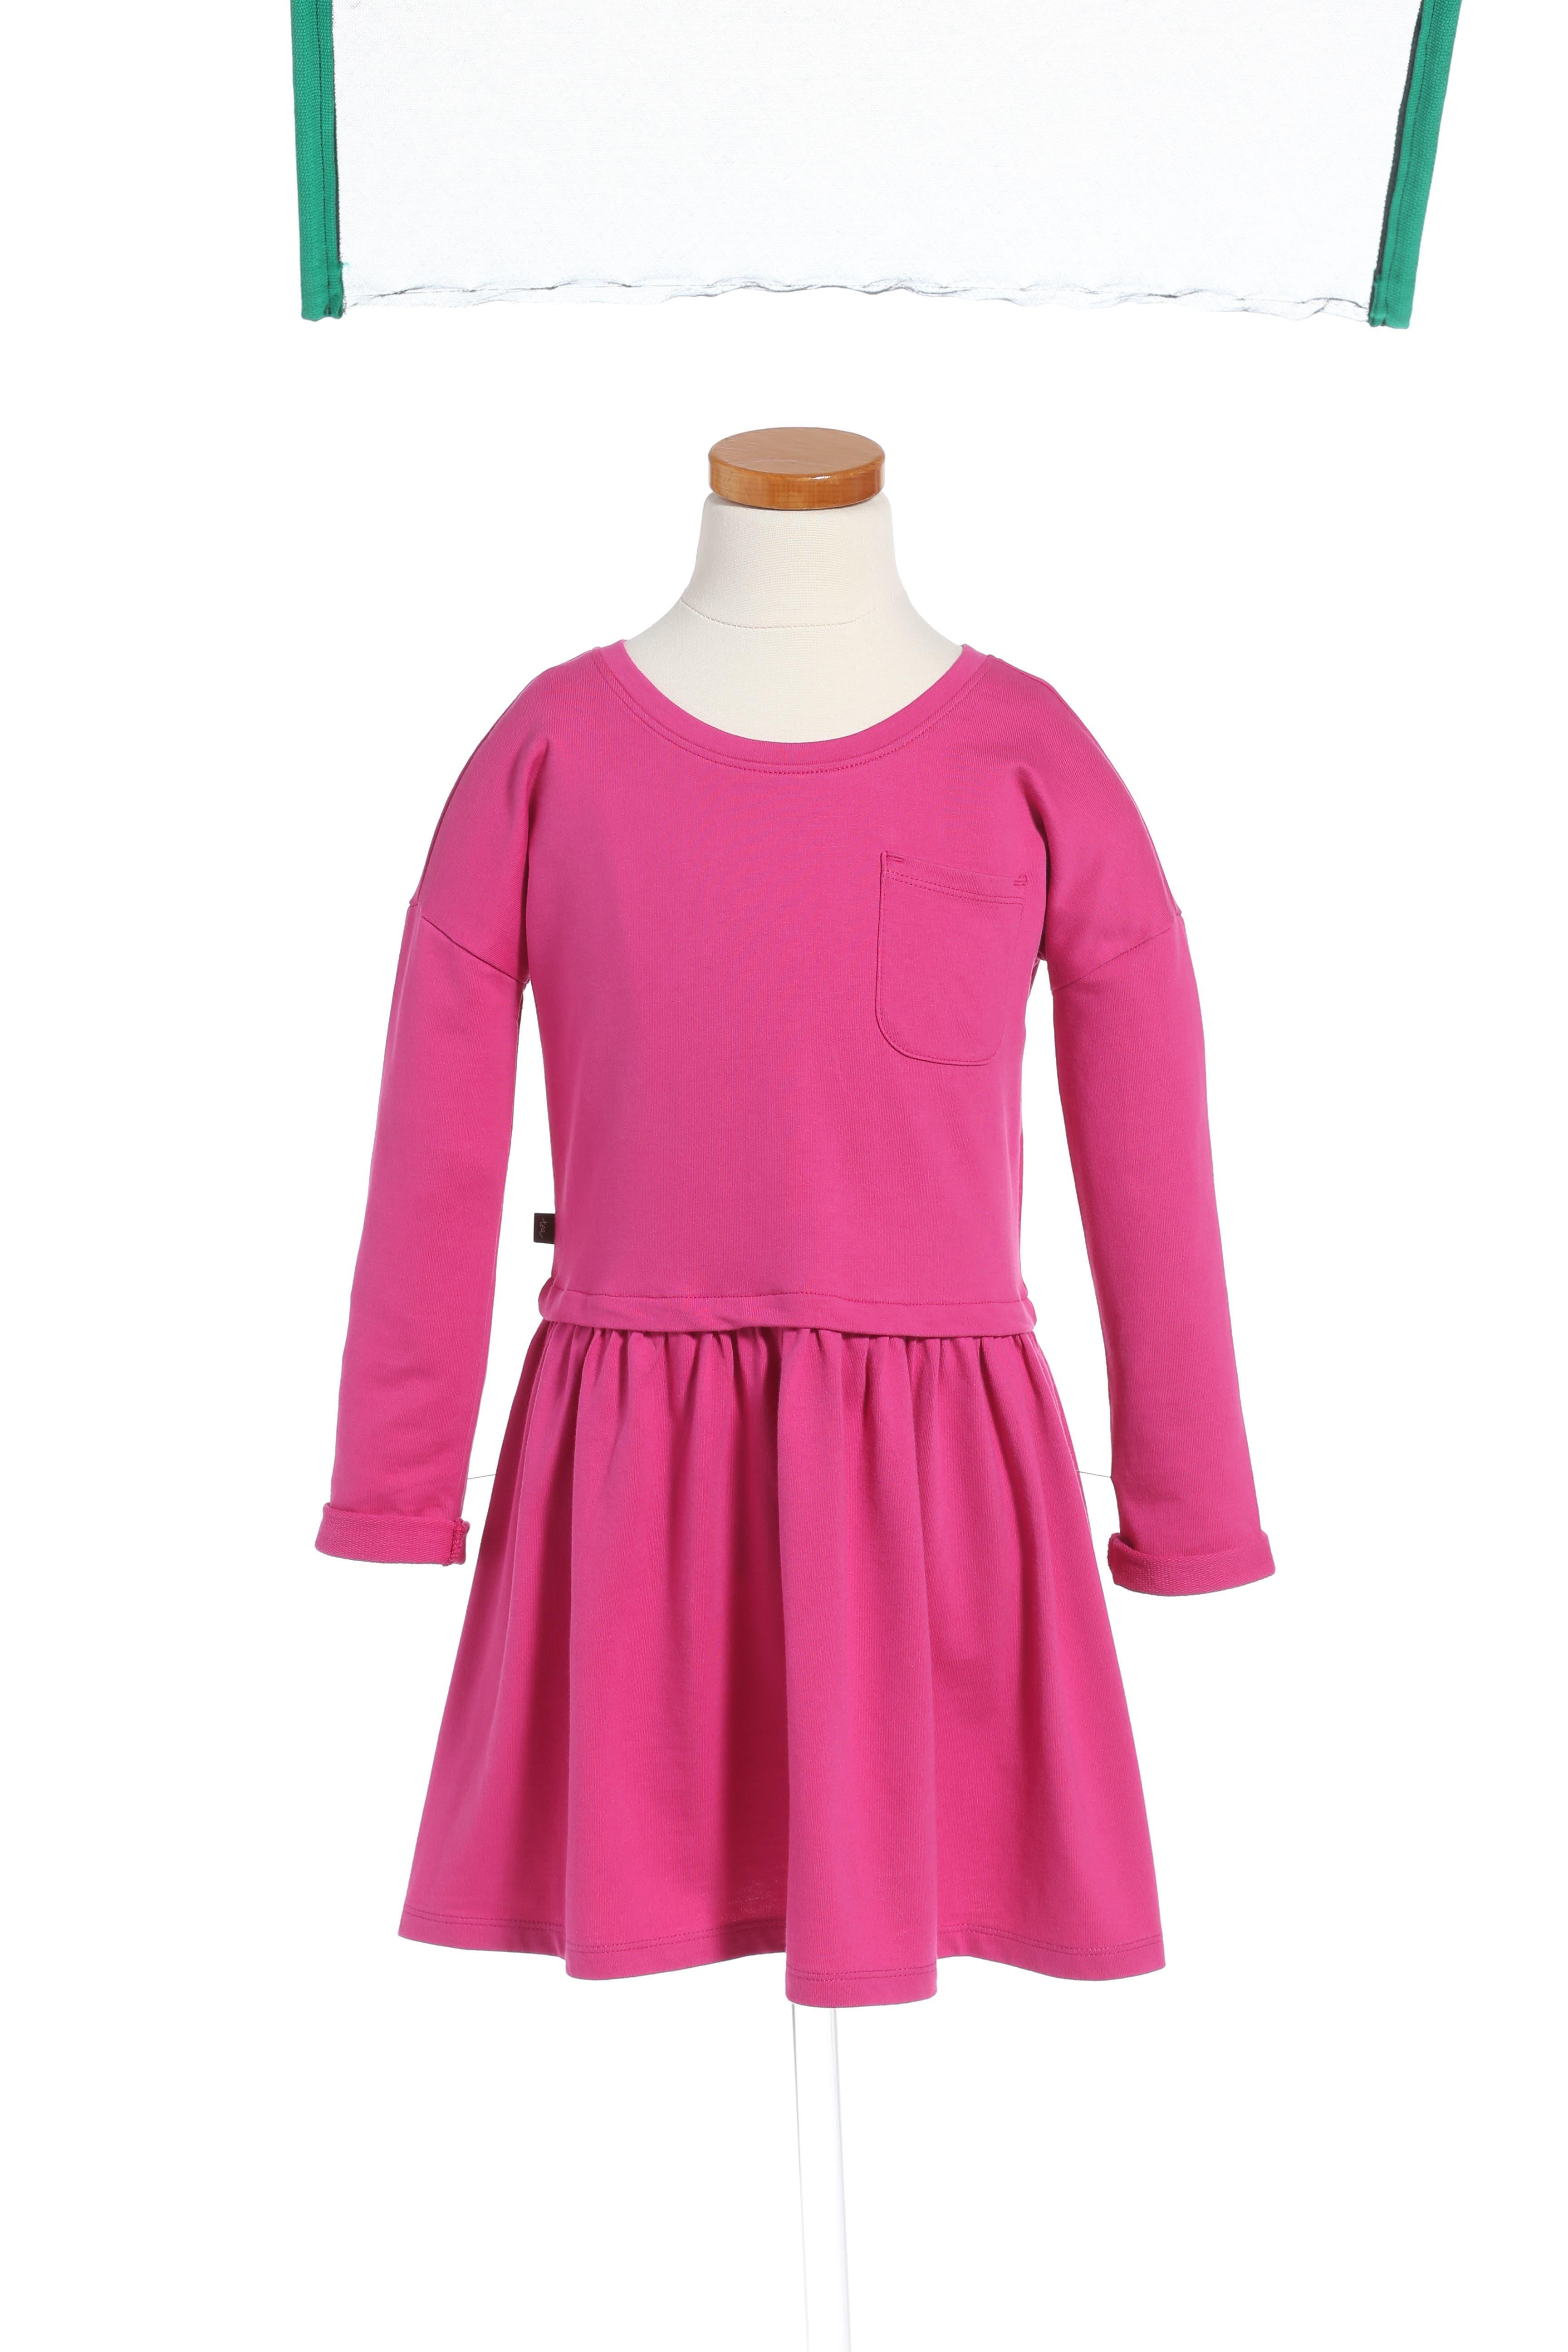 TEA COLLECTION Solid Pocket Dress